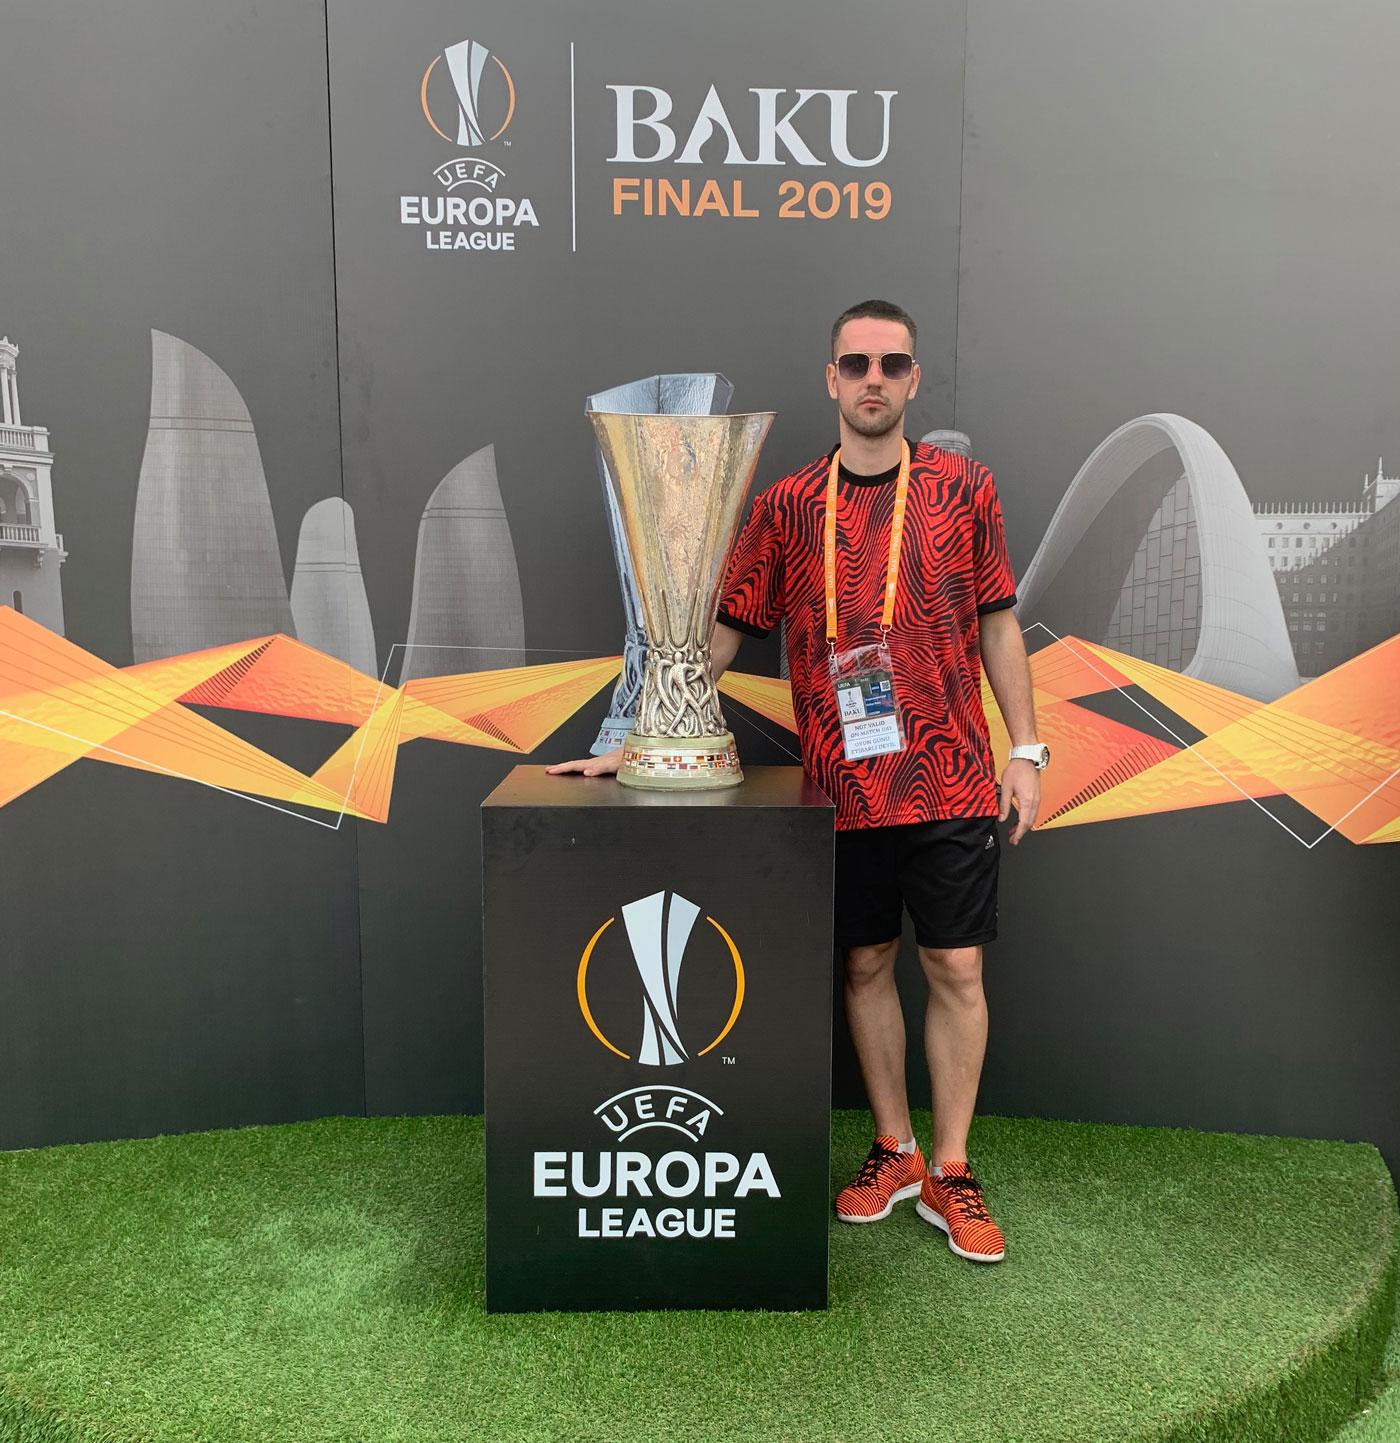 Europa League Cup with FAN